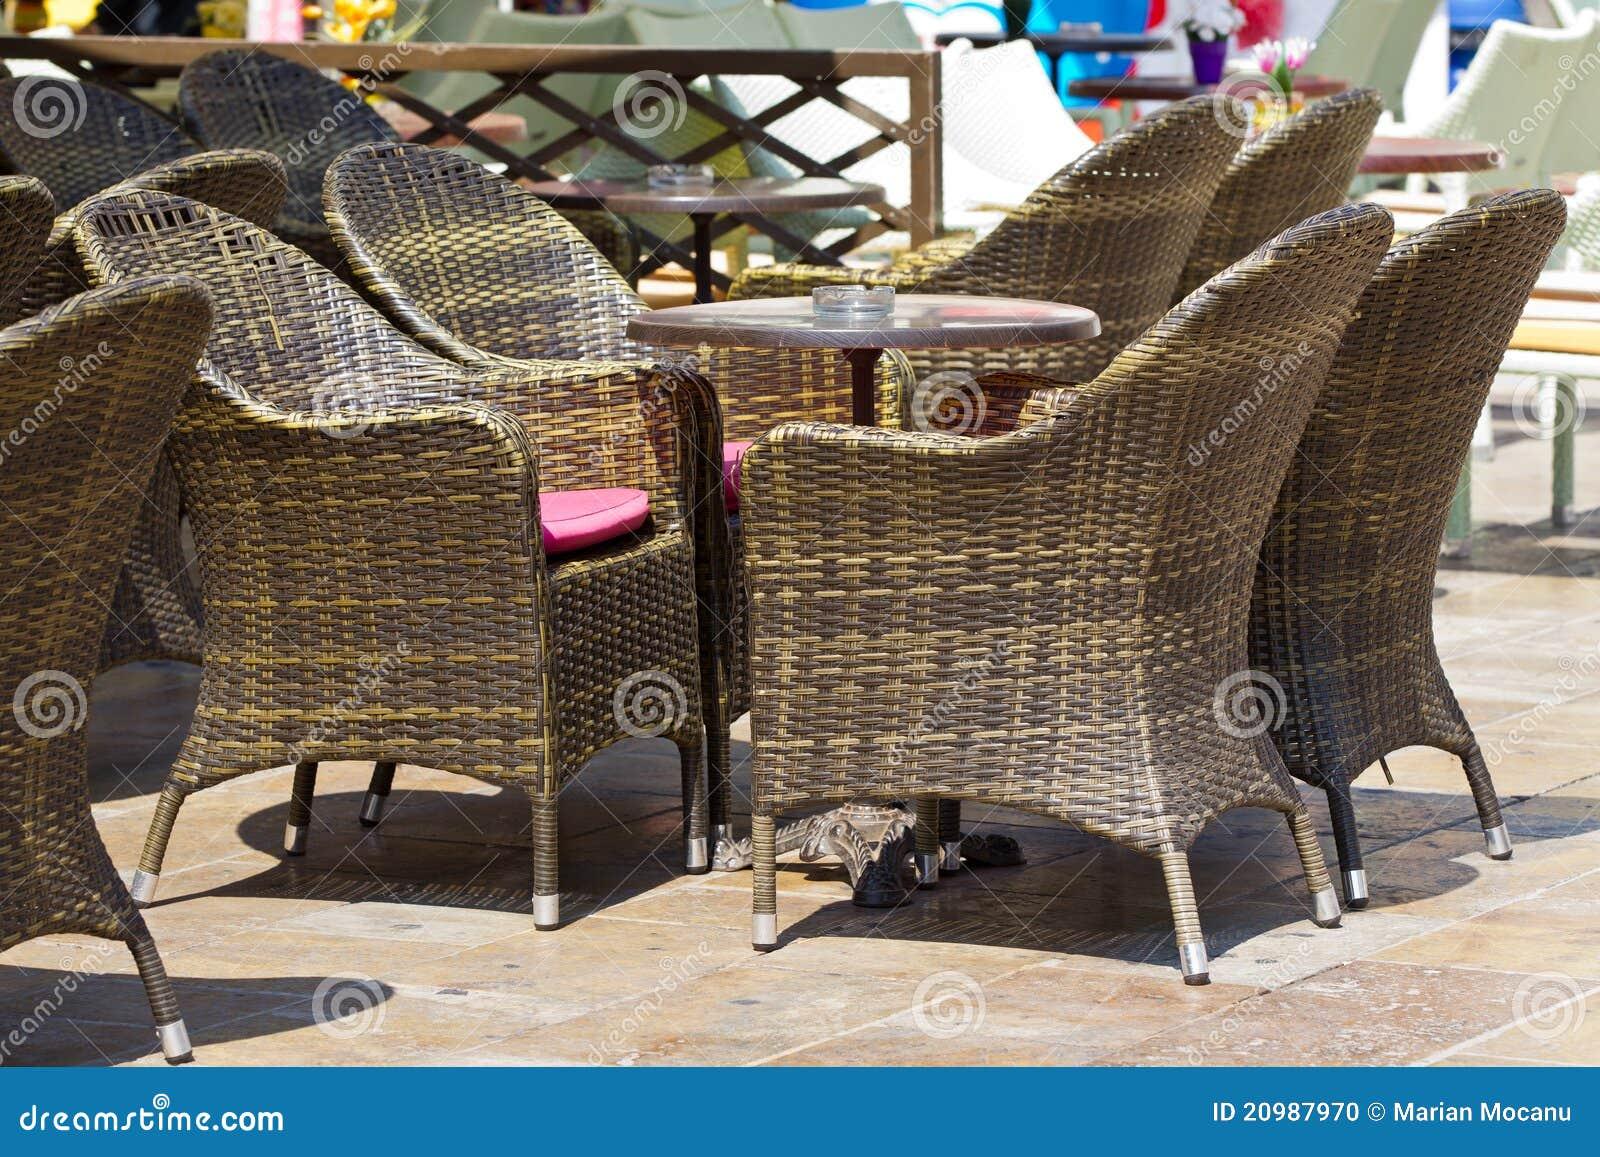 Ratan furniture on terrace